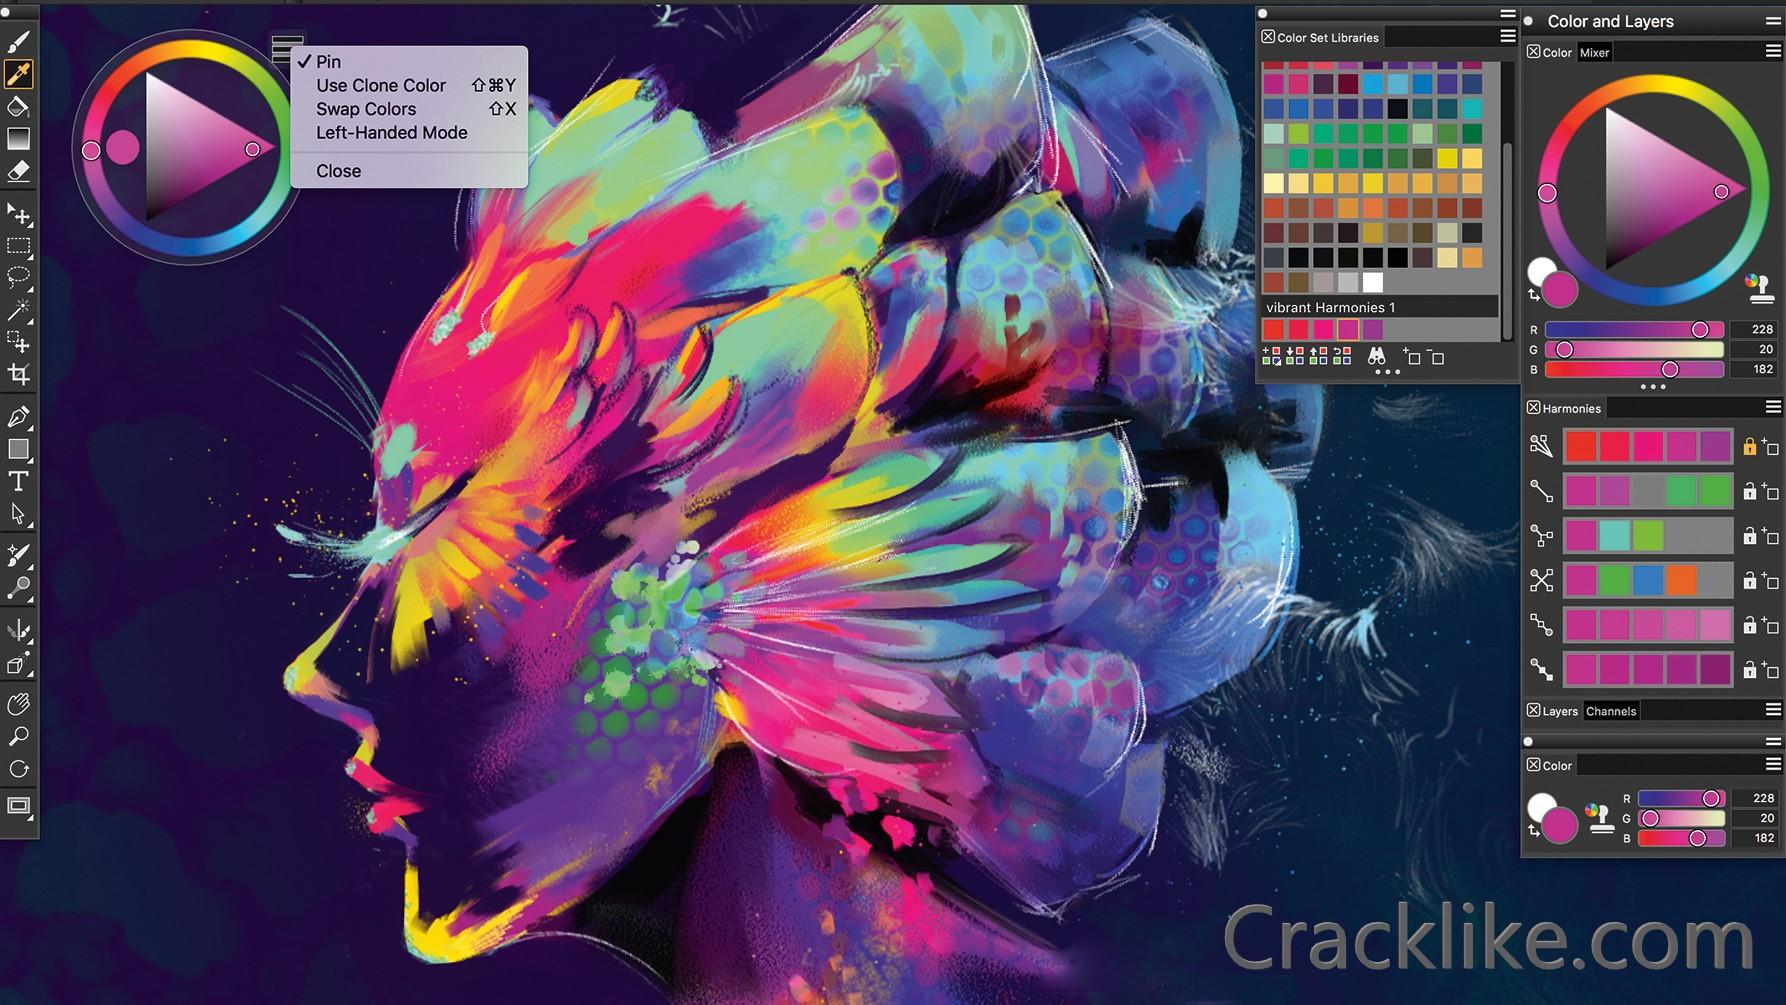 Corel Painter 2022 Crack Full Torrent Plus Latest Keygen Free Download